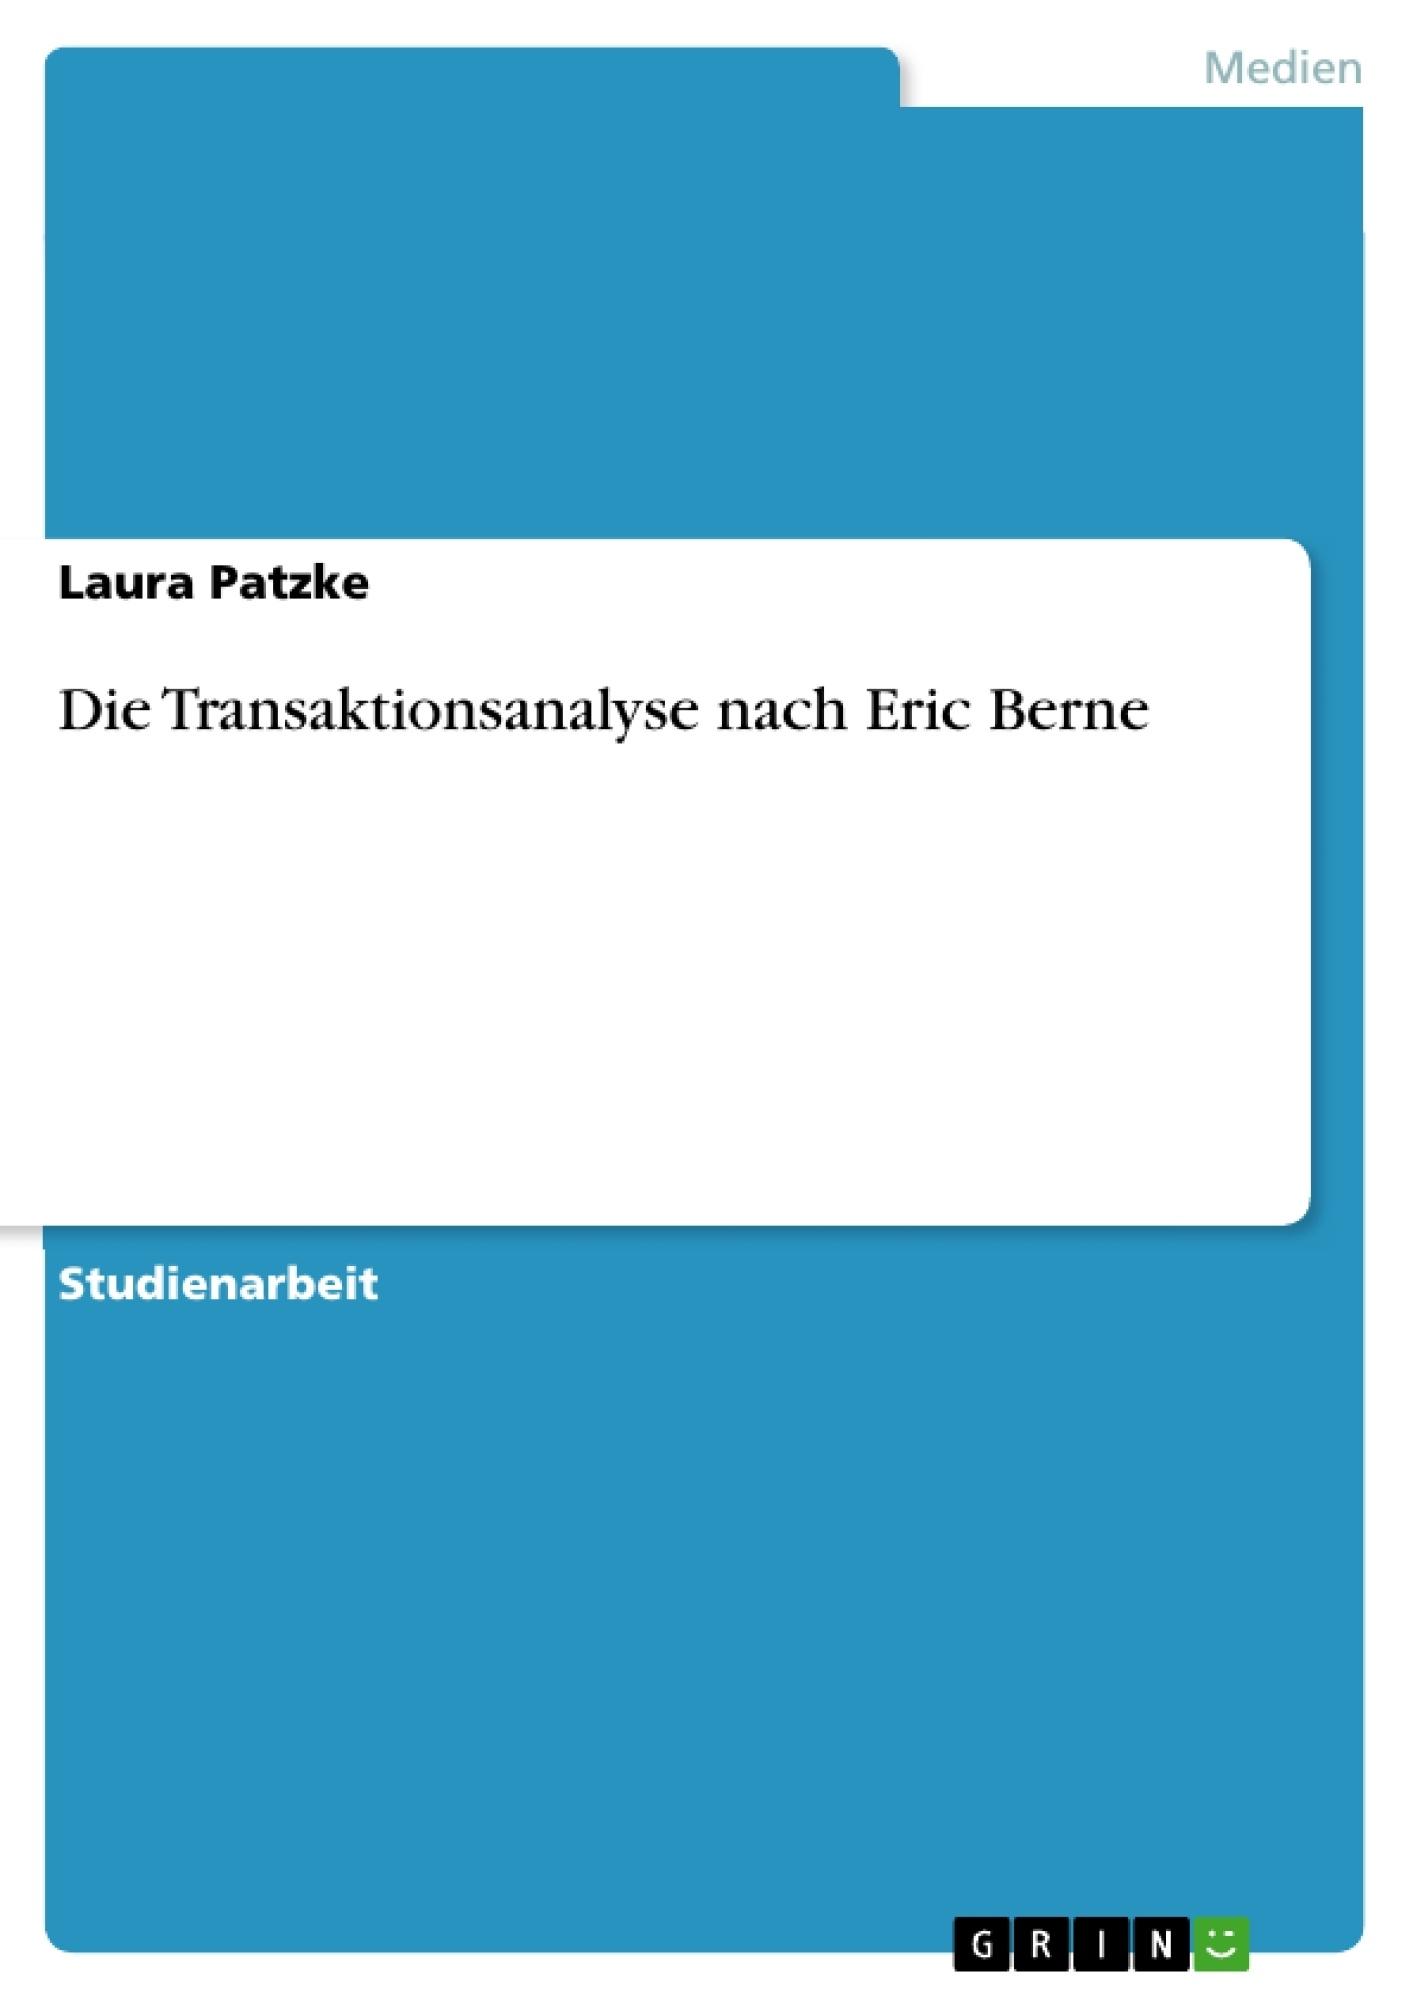 Titel: Die Transaktionsanalyse nach Eric Berne